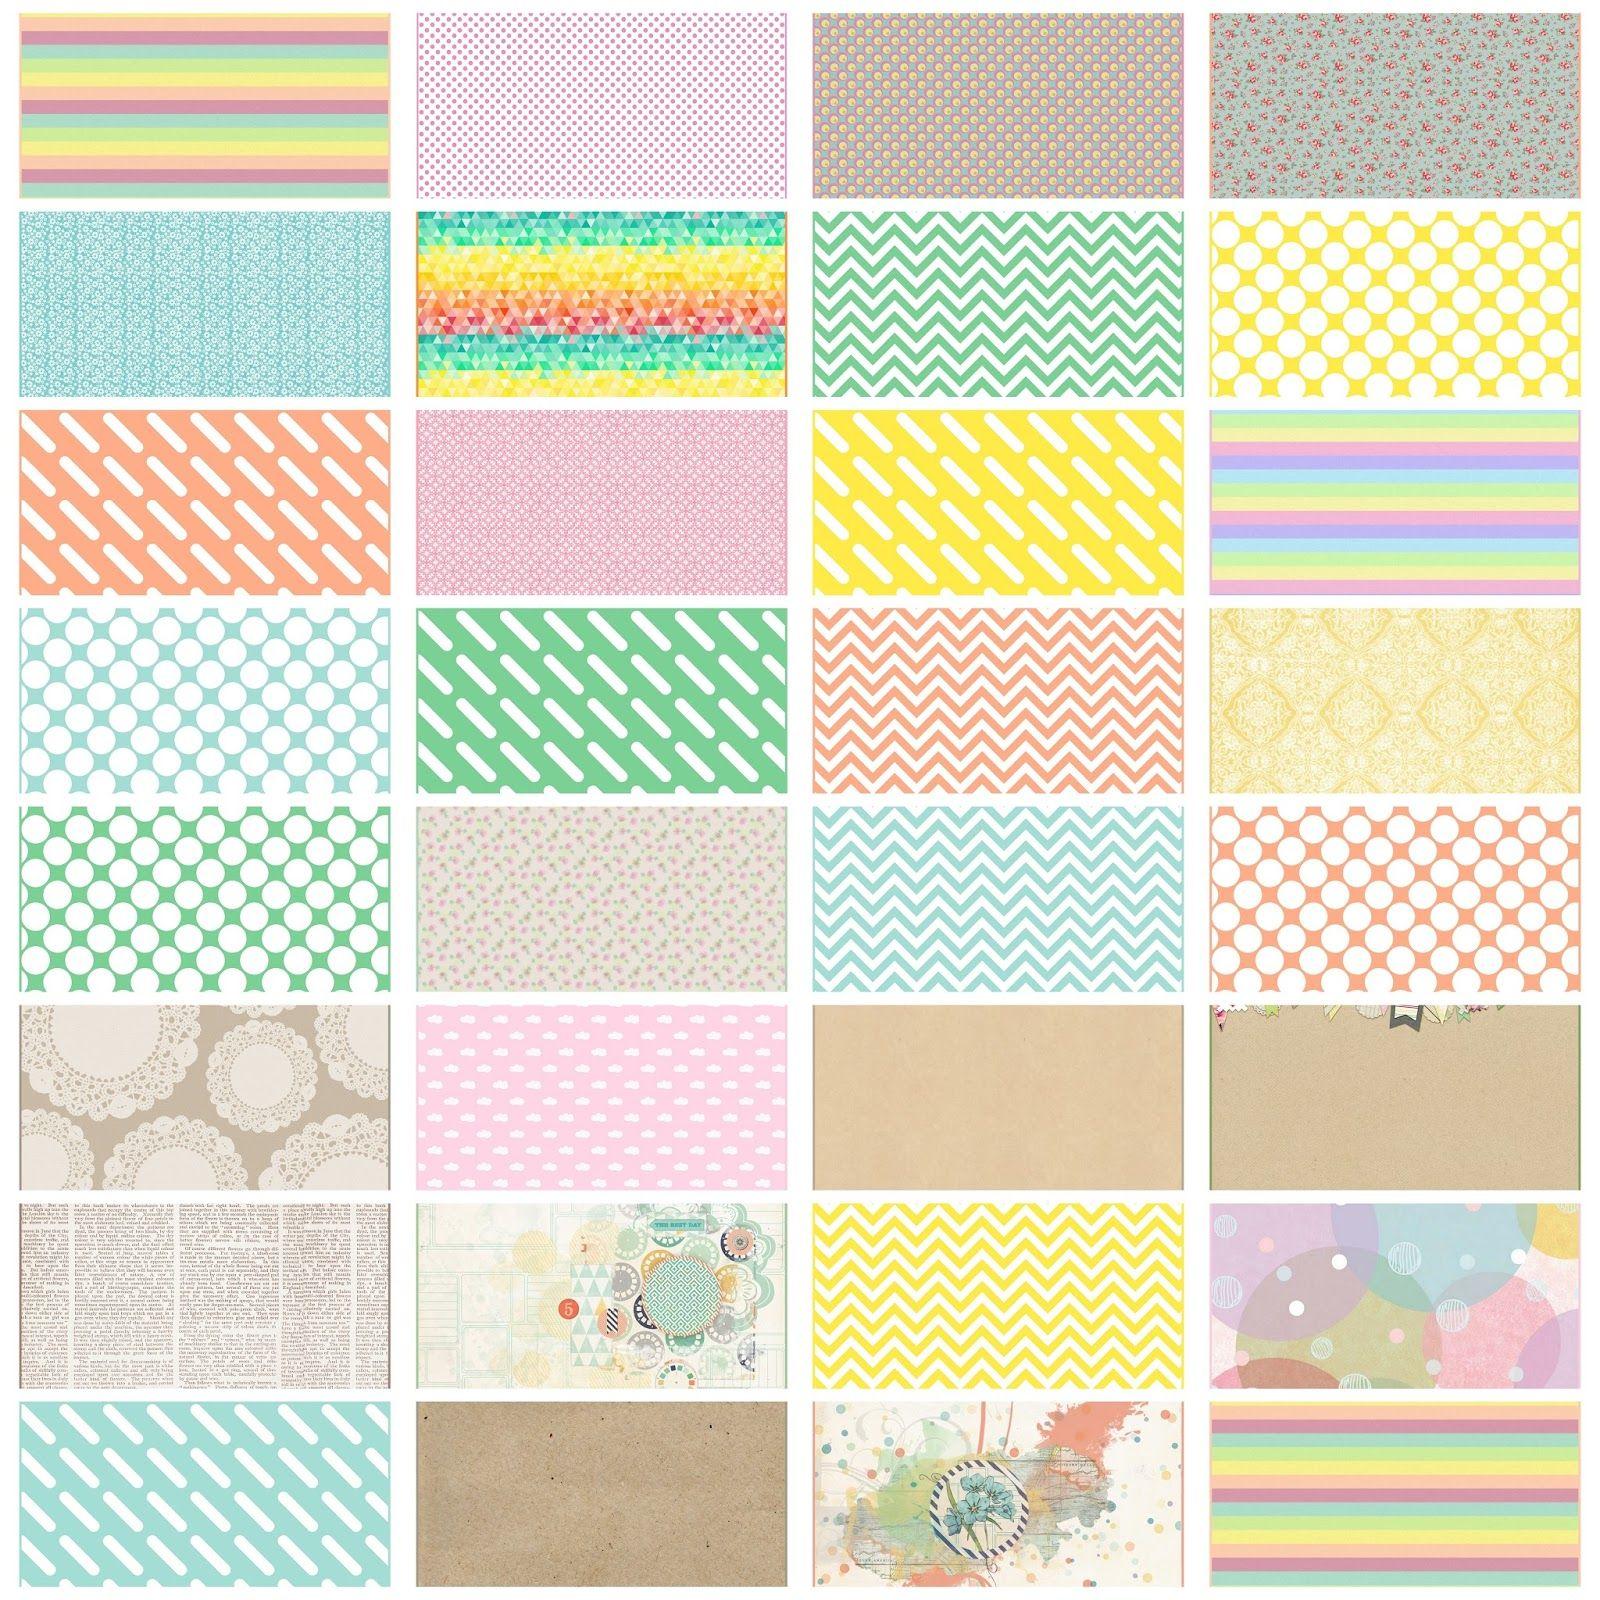 قسم المطويات لملف الانجاز بحث Google How To Make Stickers Diy Home Crafts Blog Making